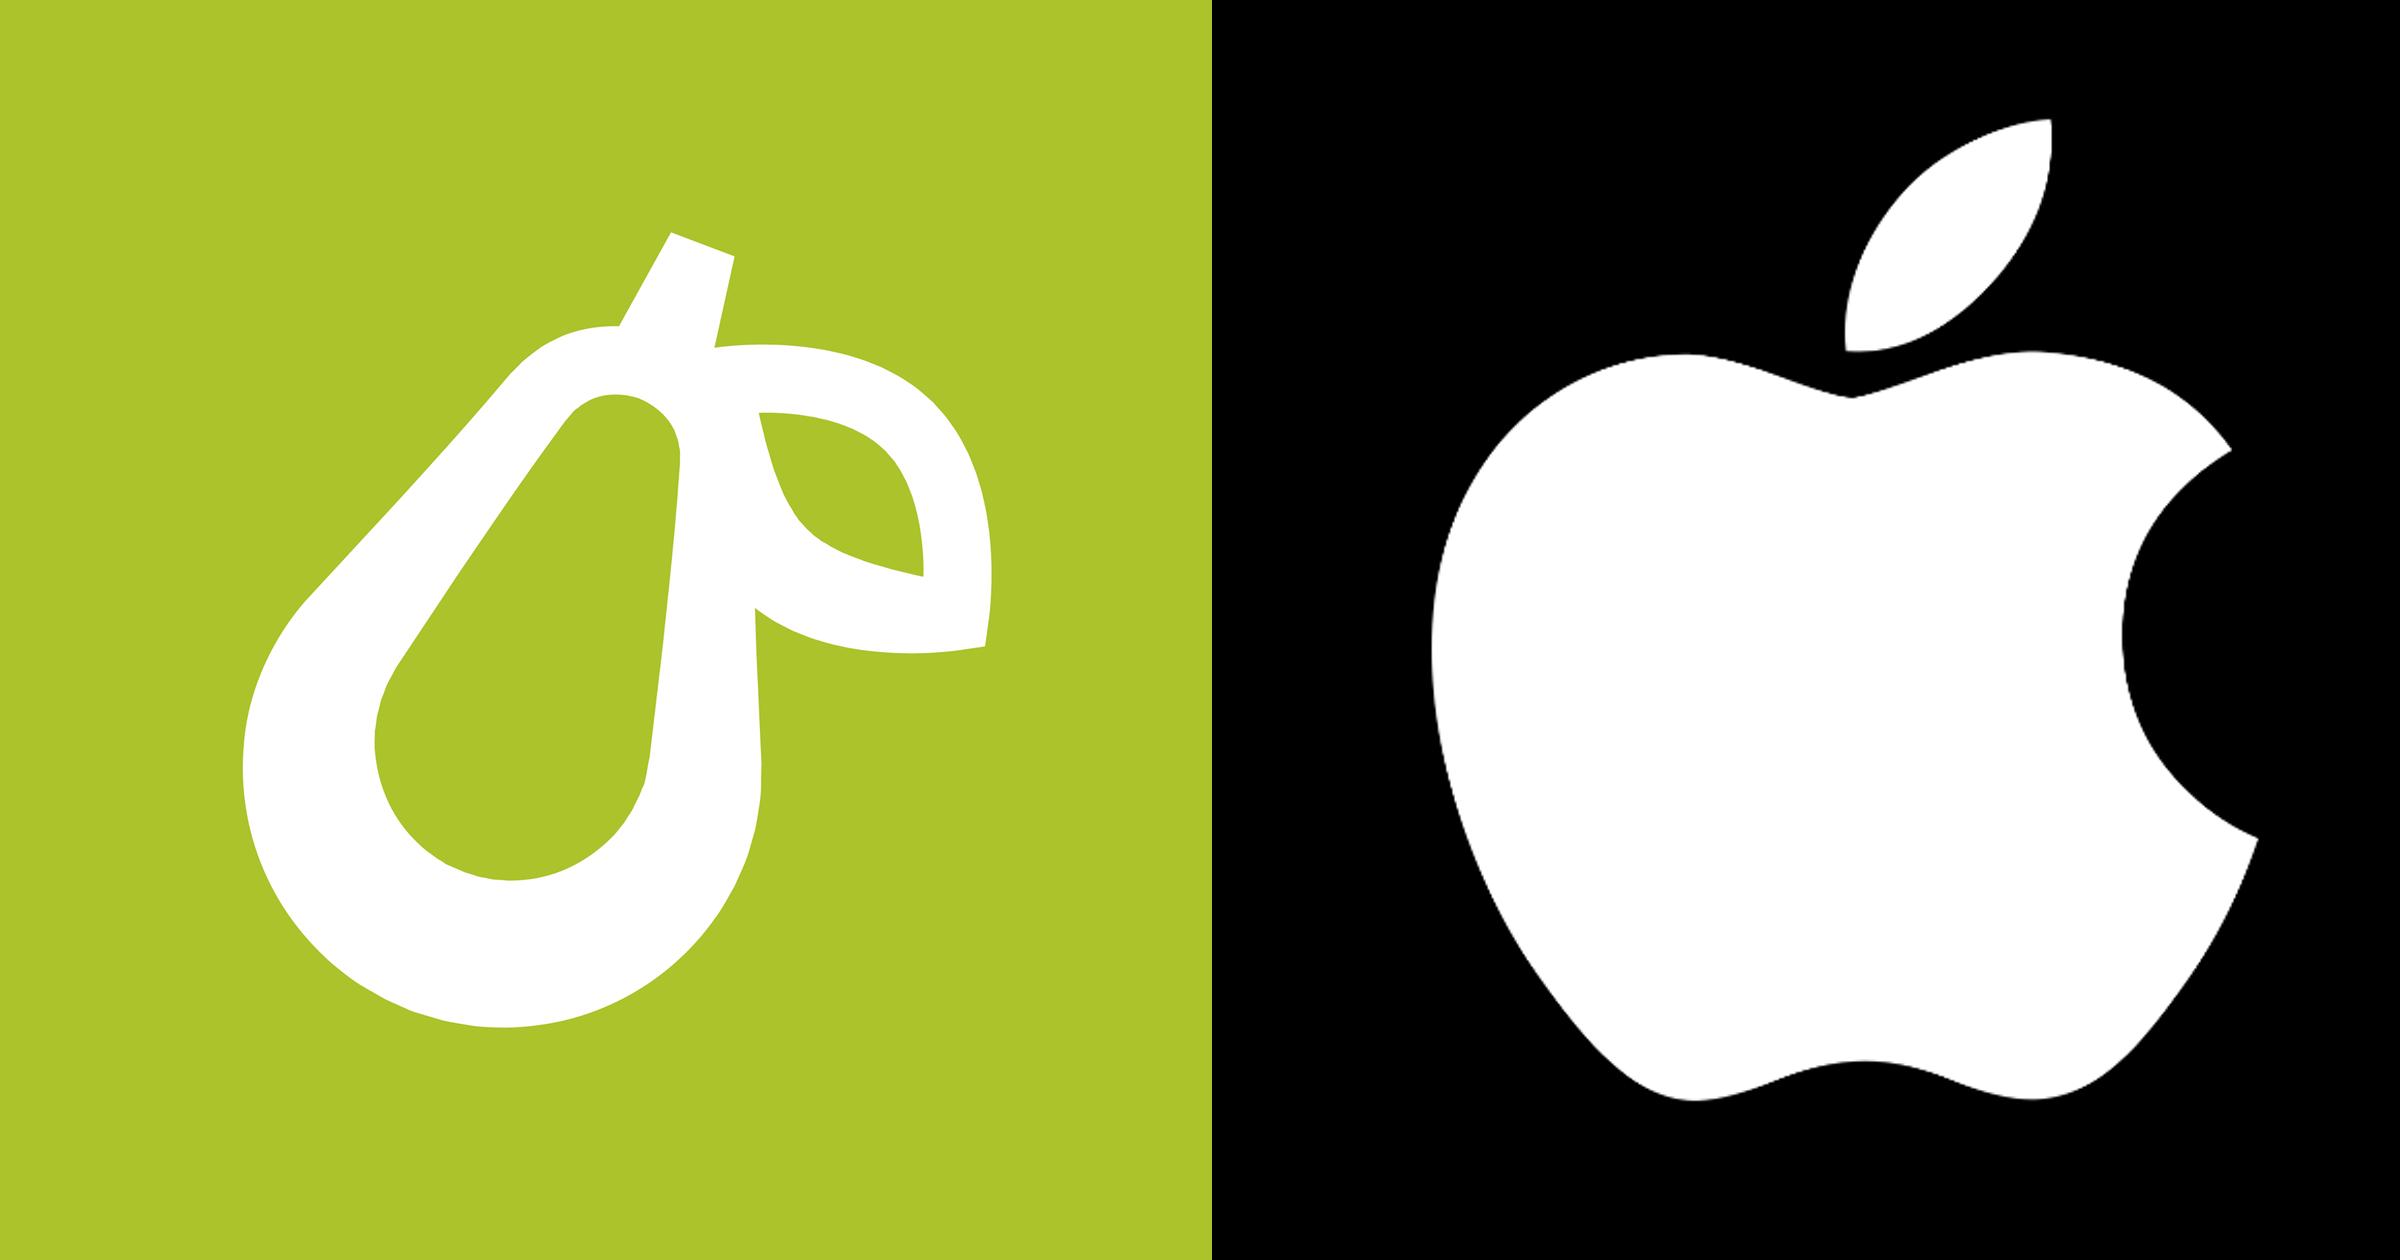 Prepear Pear logo and Apple logo